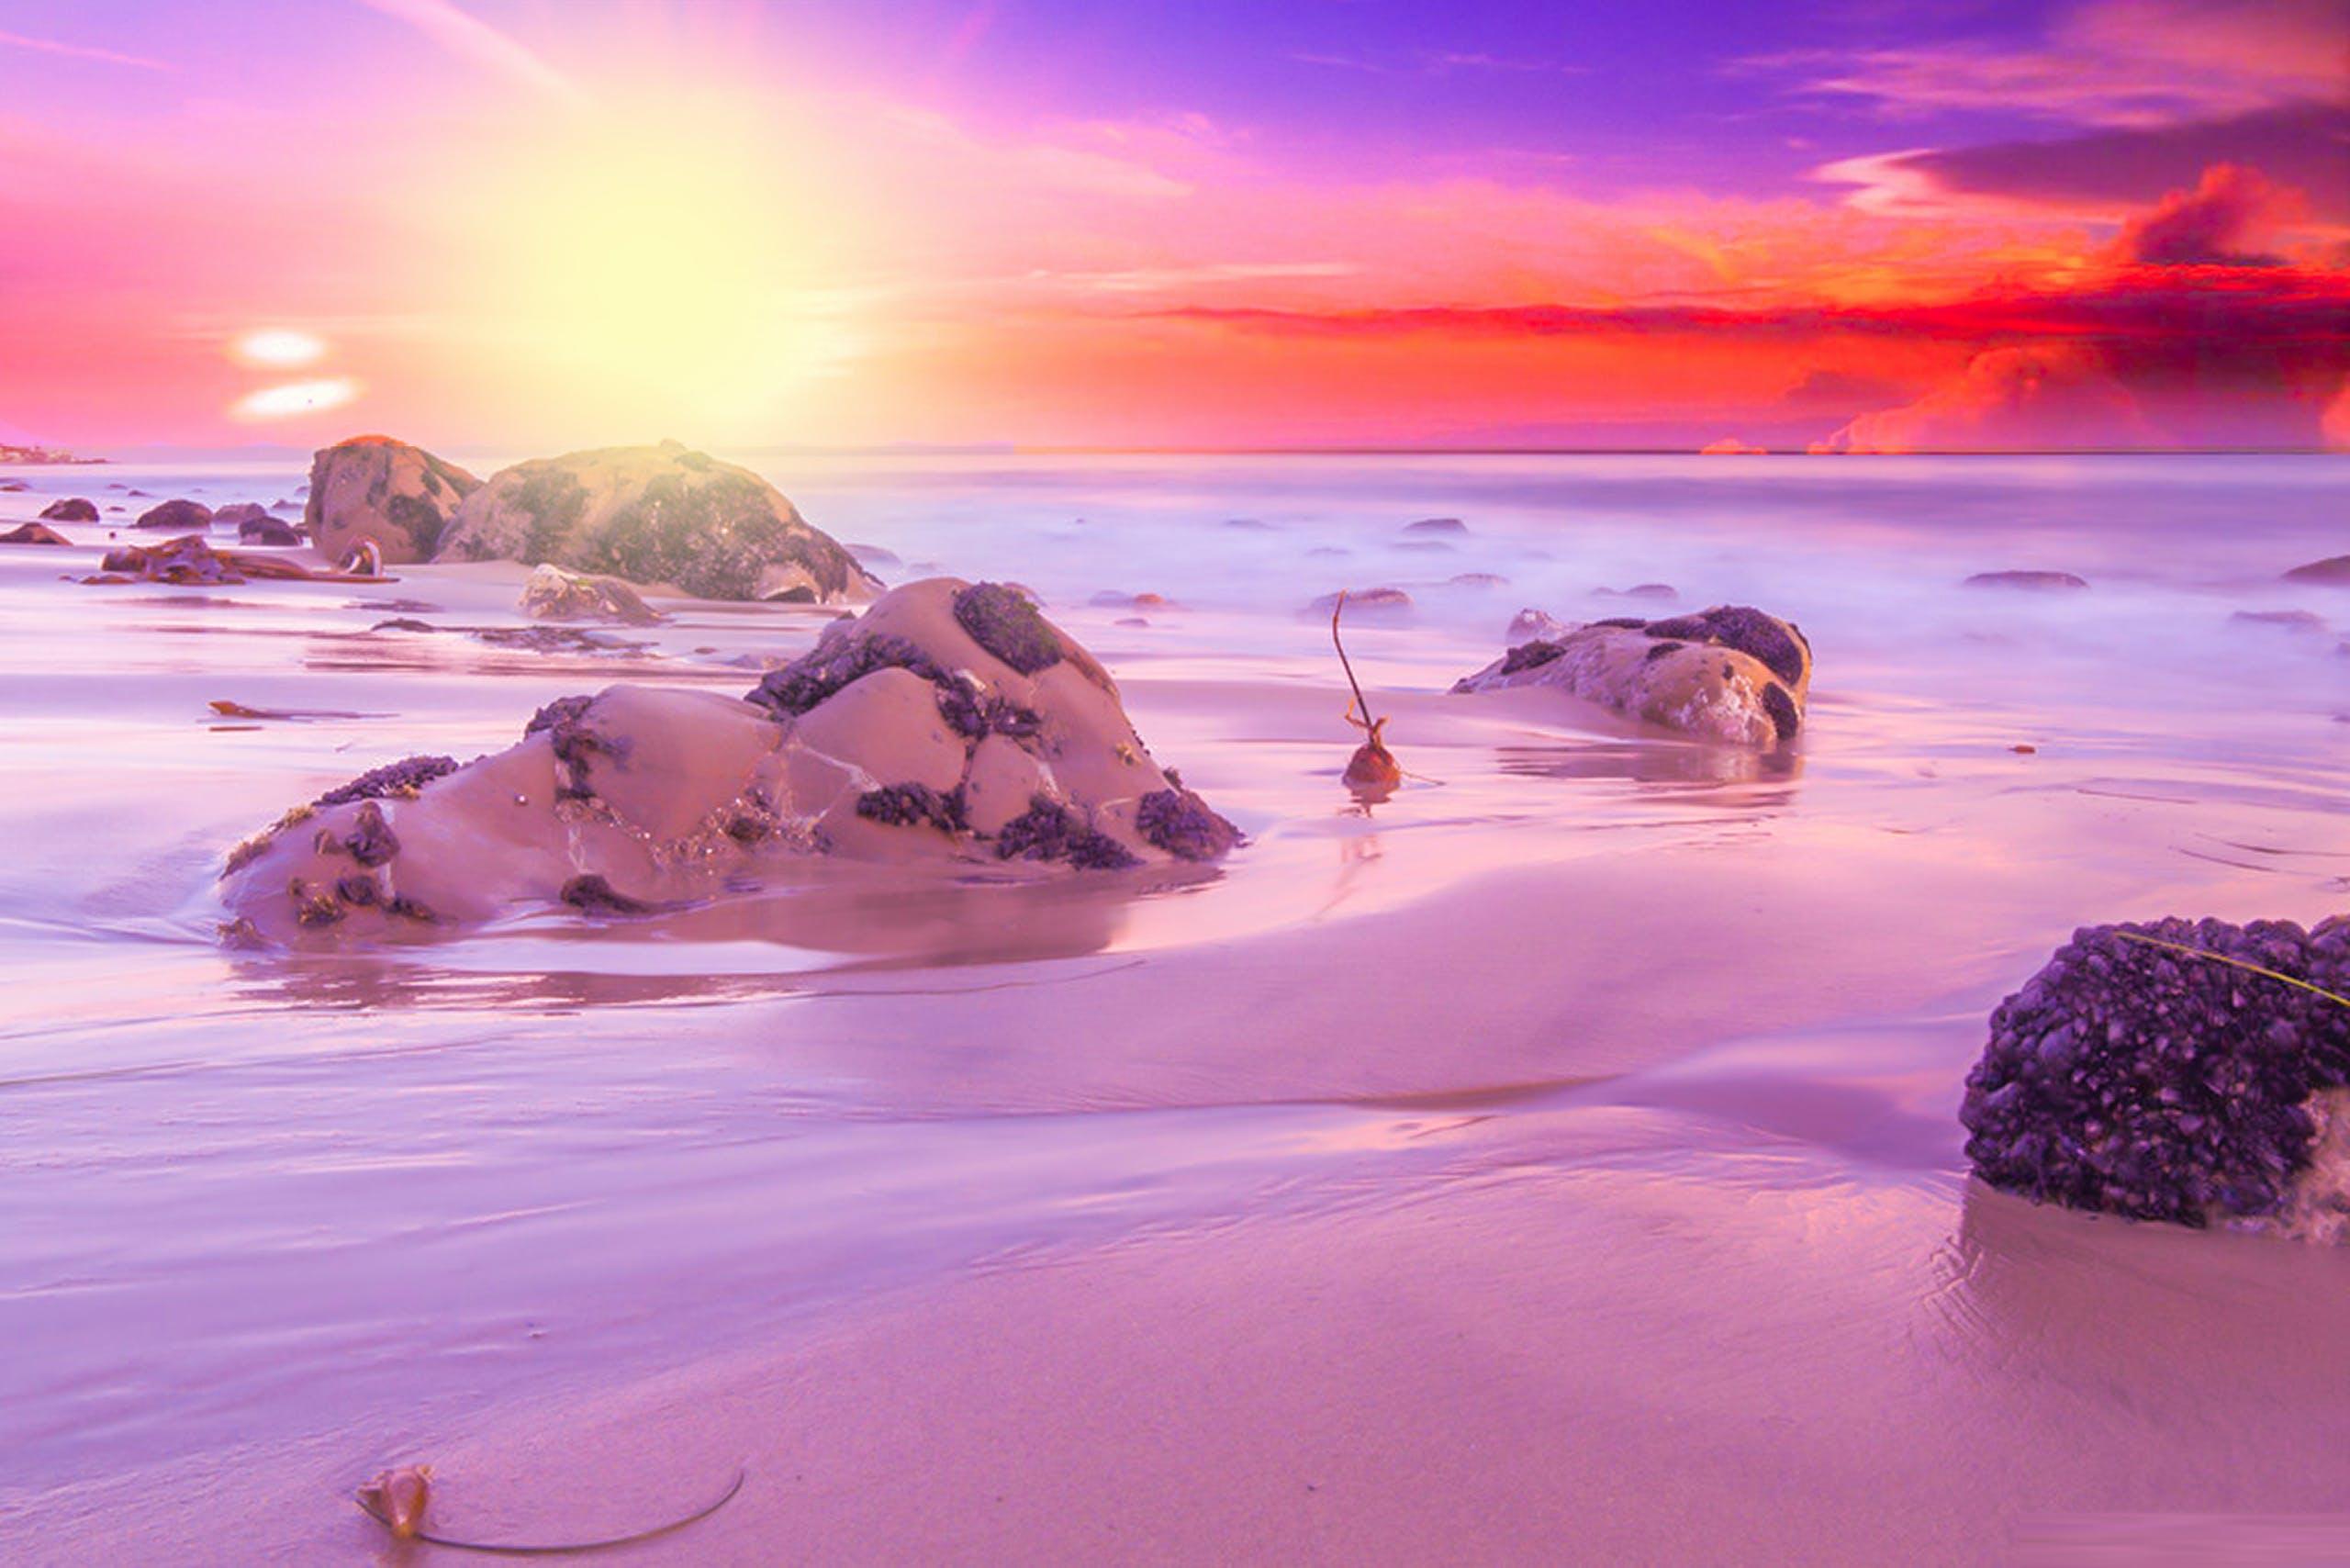 Free stock photo of bright, nature, scene, scenery